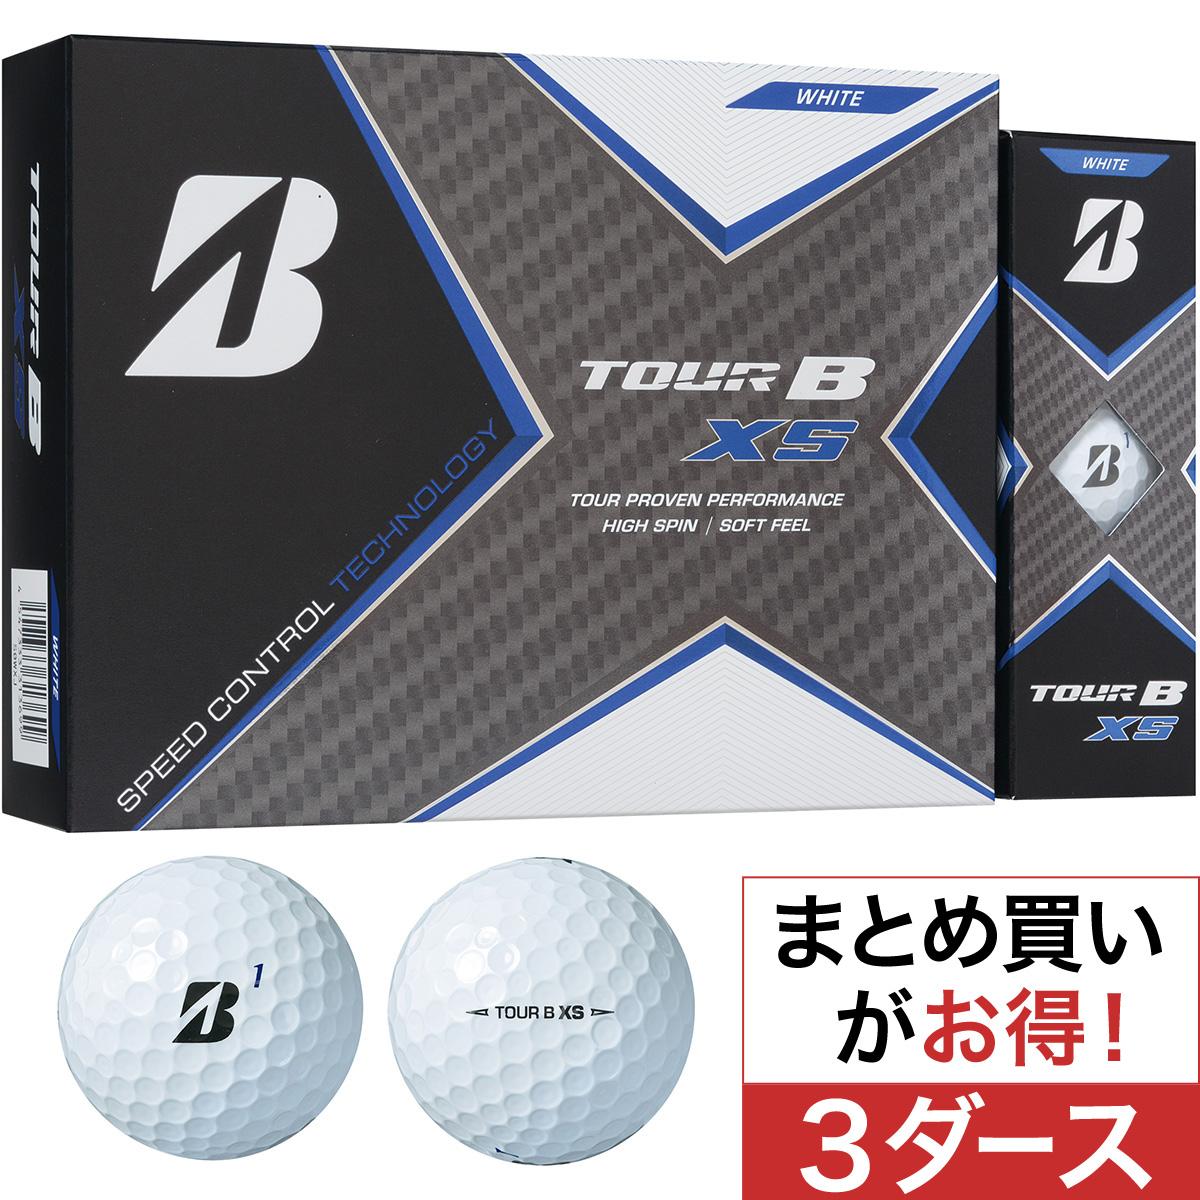 TOUR B XS ボール 3ダースセット